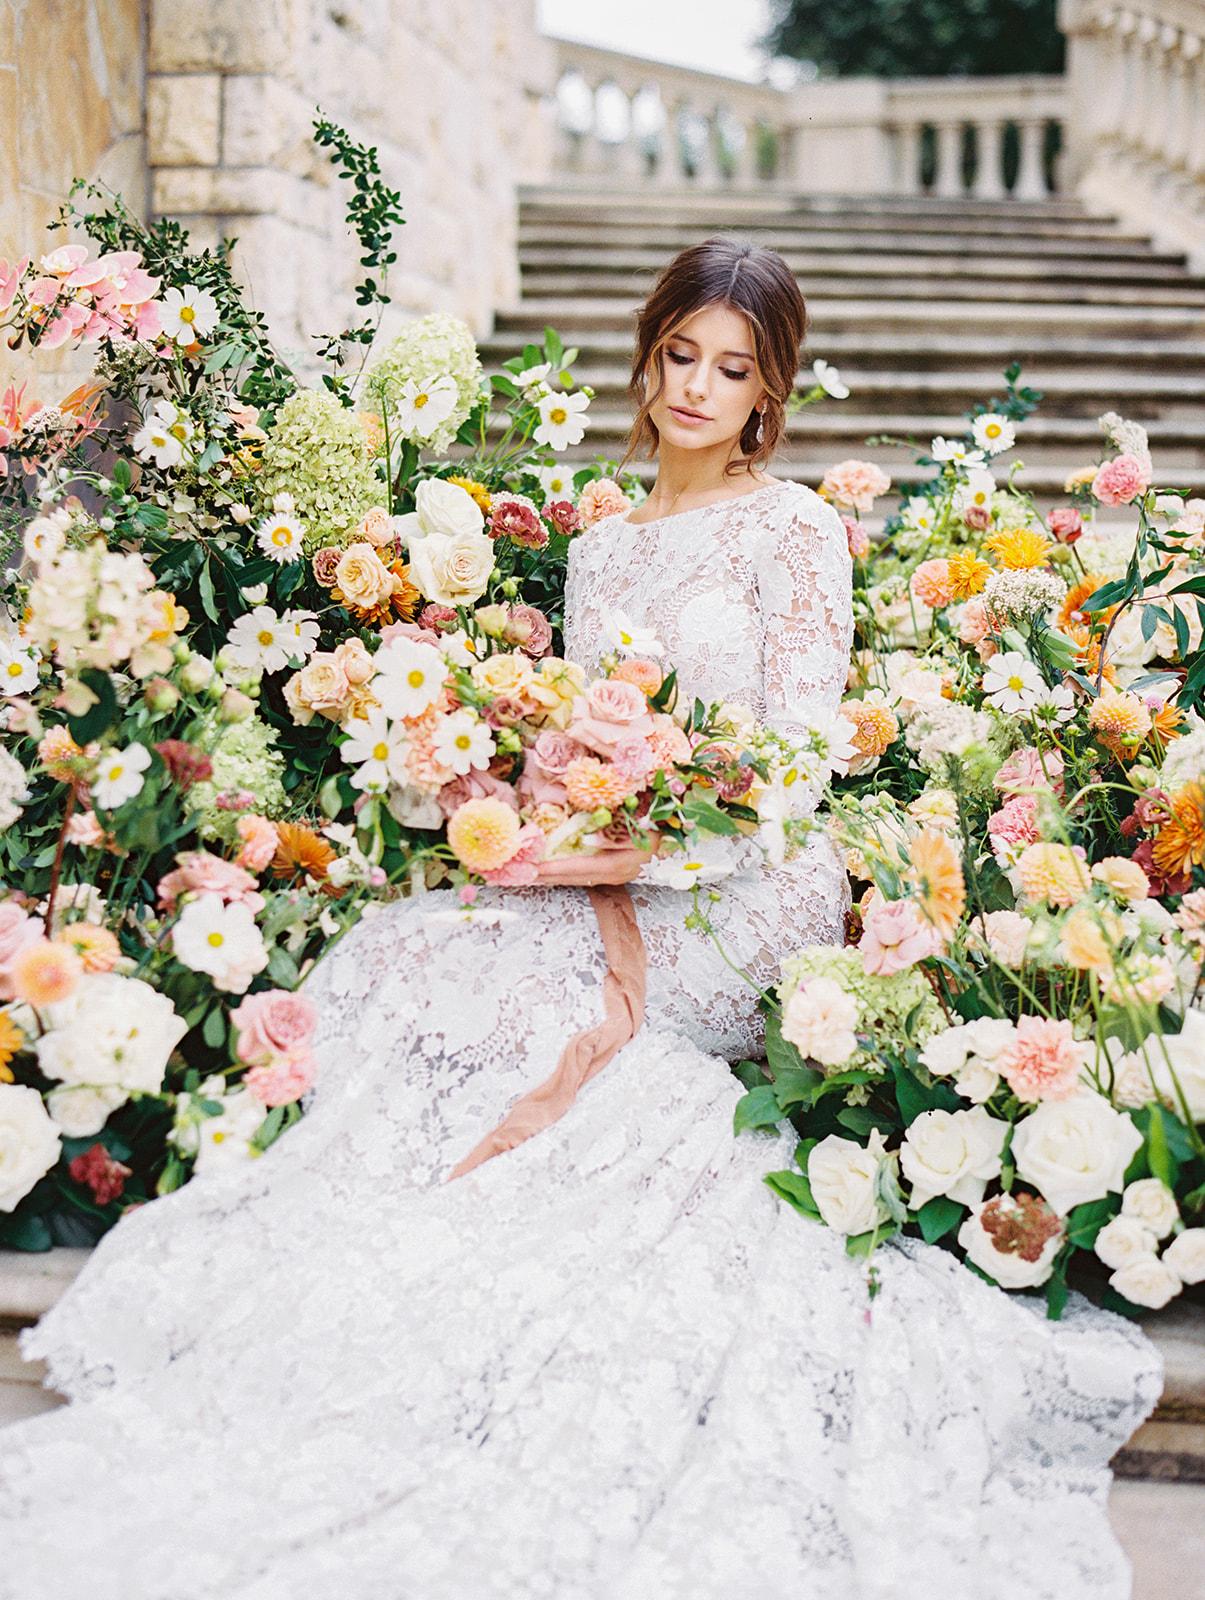 Blushington Blooms Bridal Floral Design